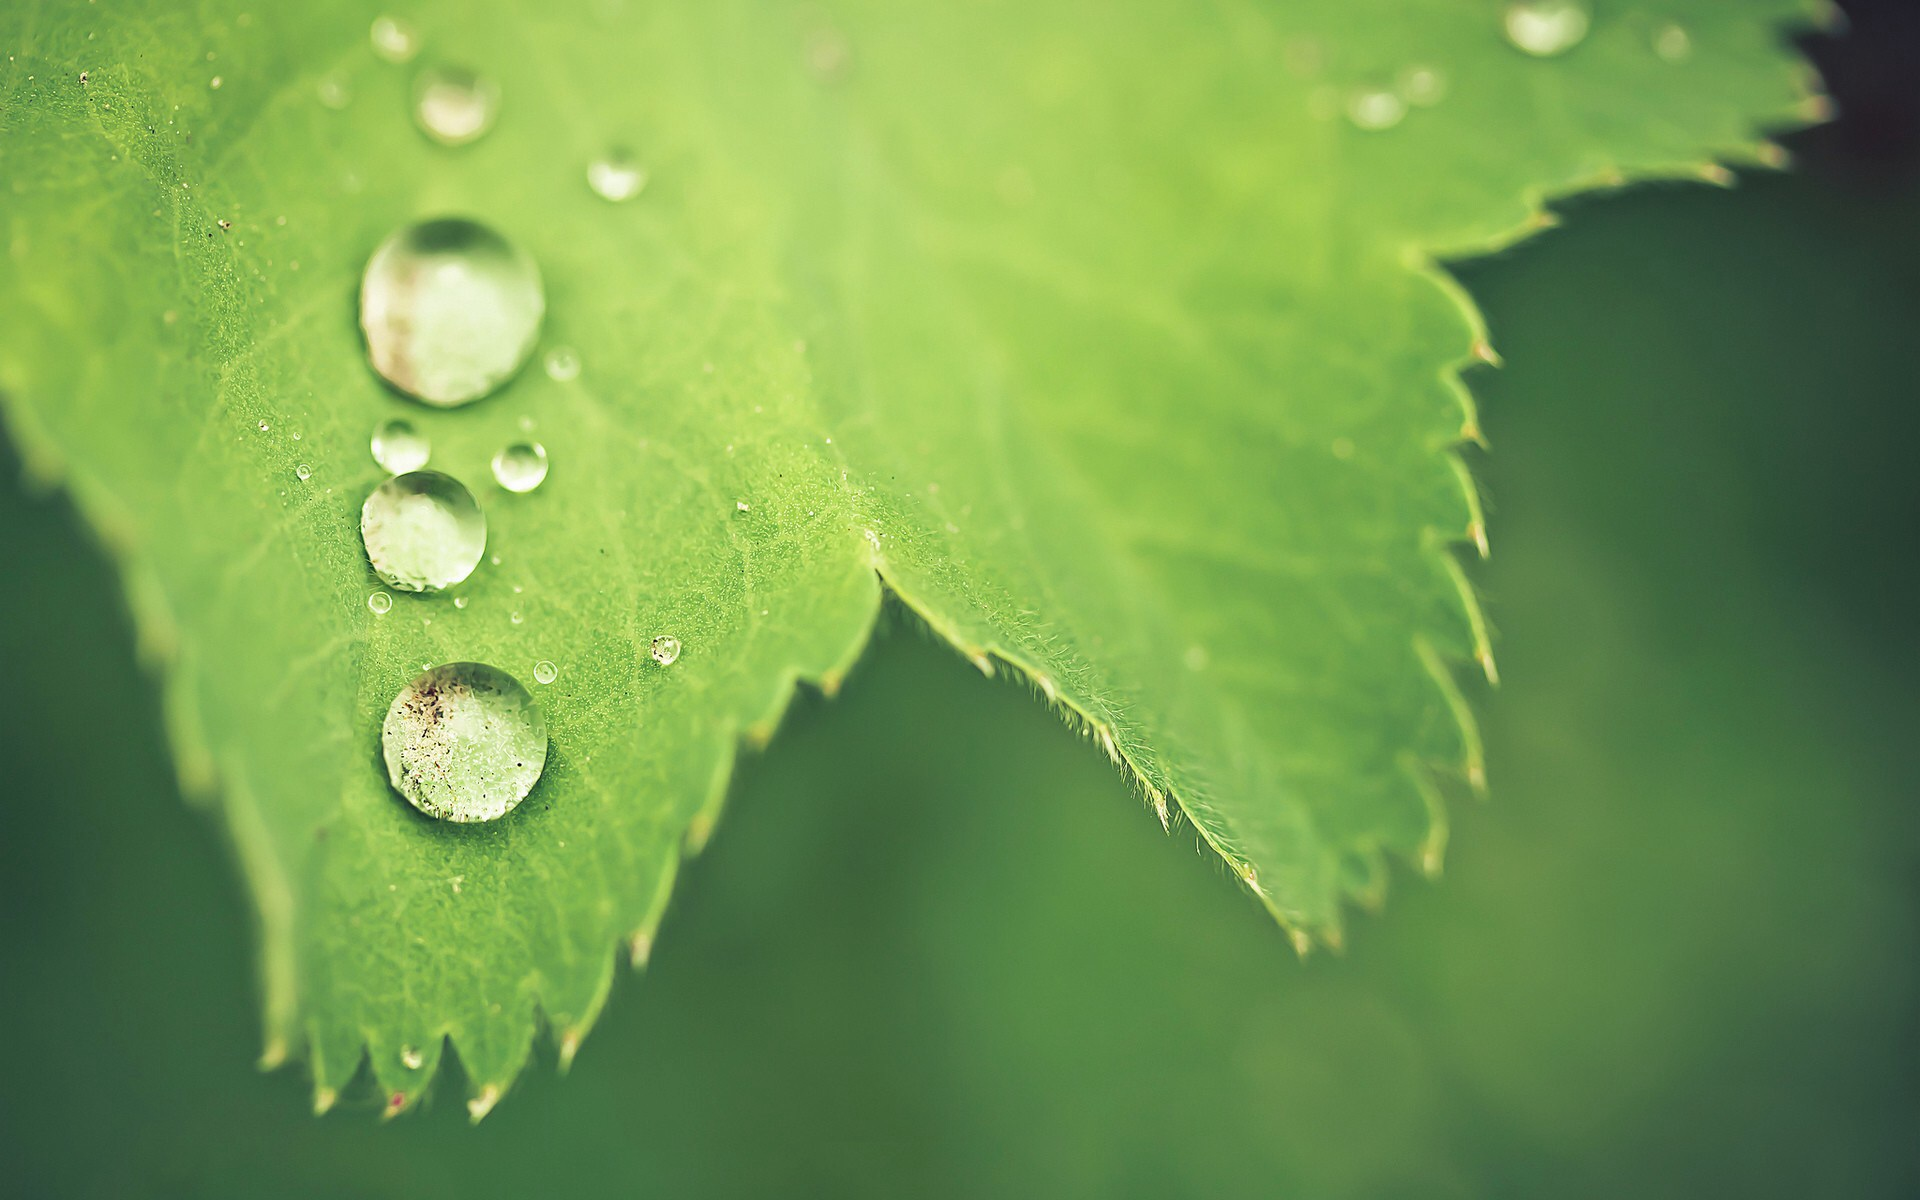 Stunning Leaf Macro Wallpaper